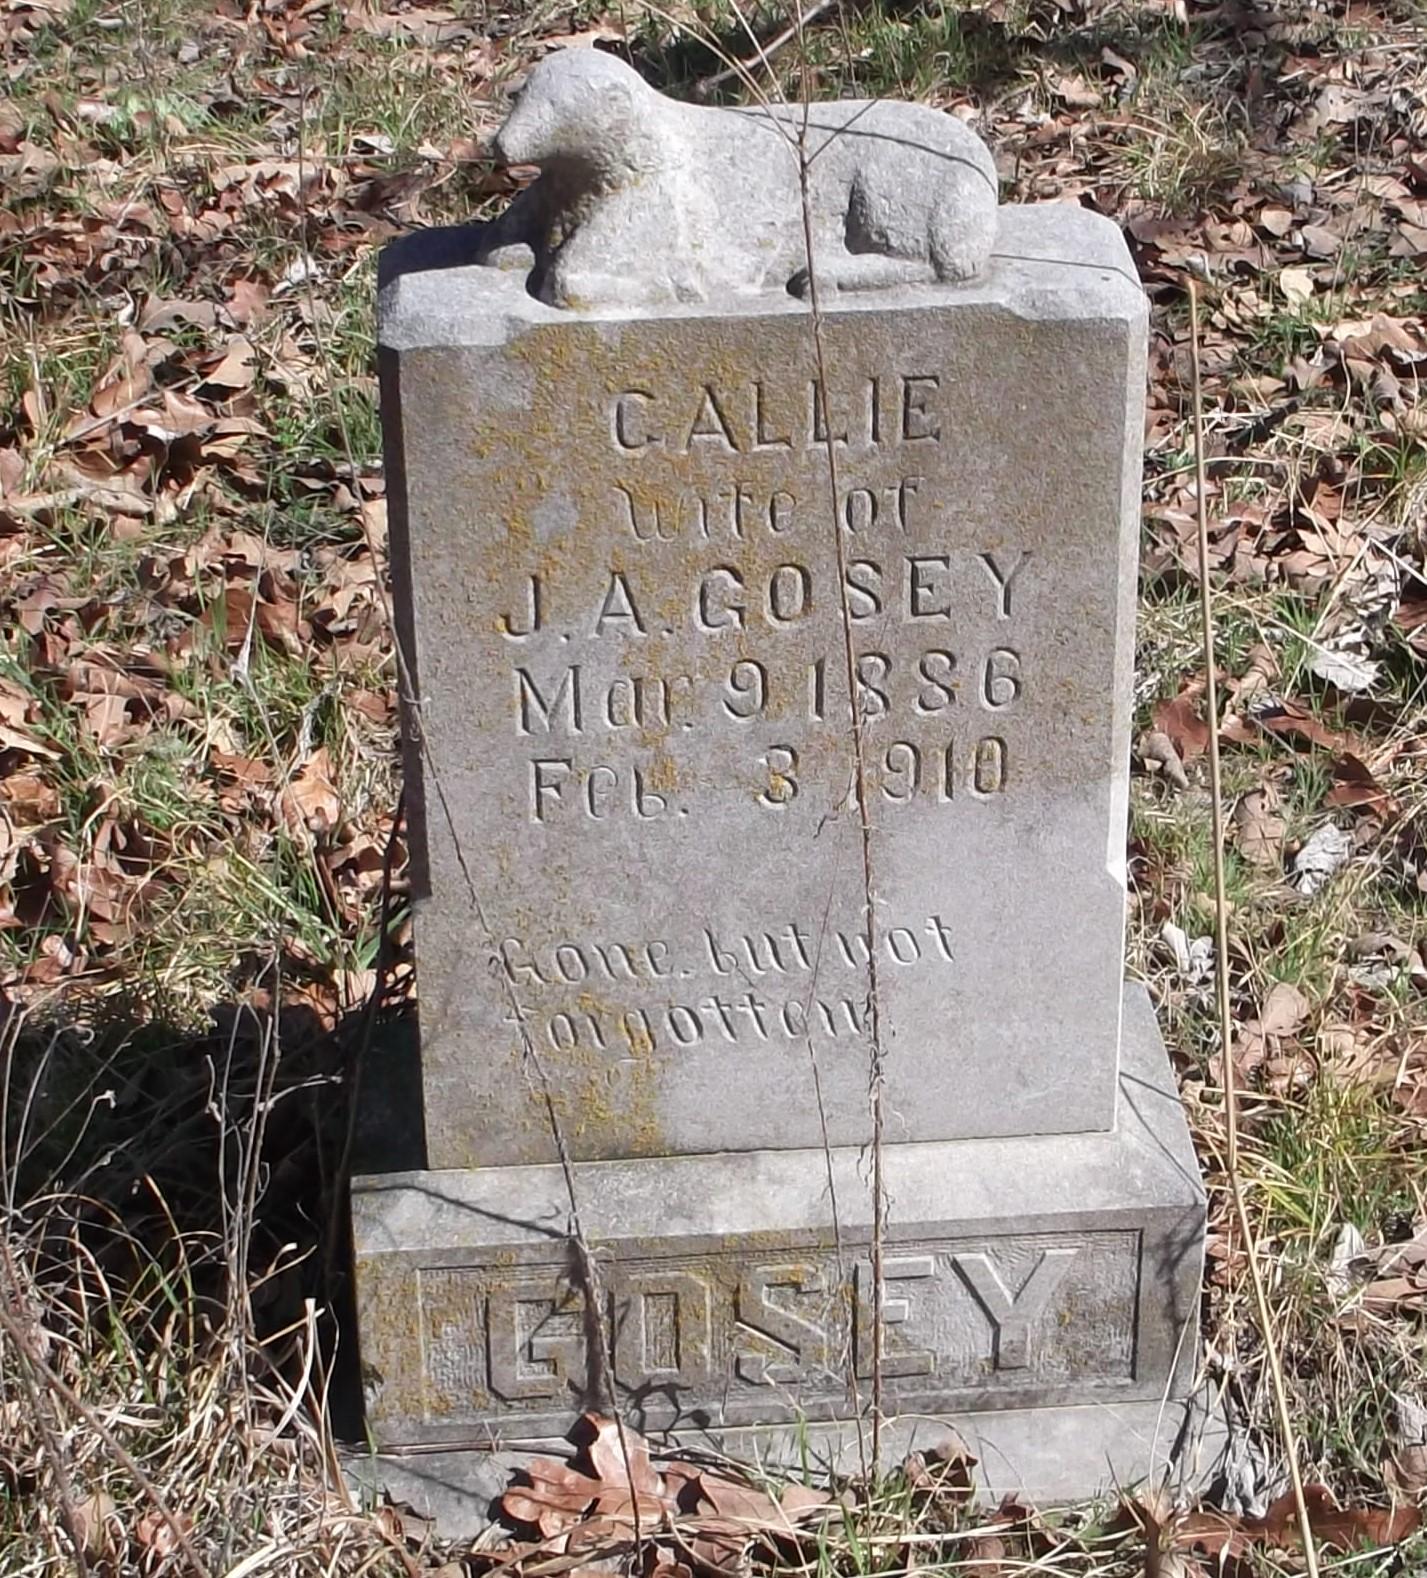 Callie Gosey